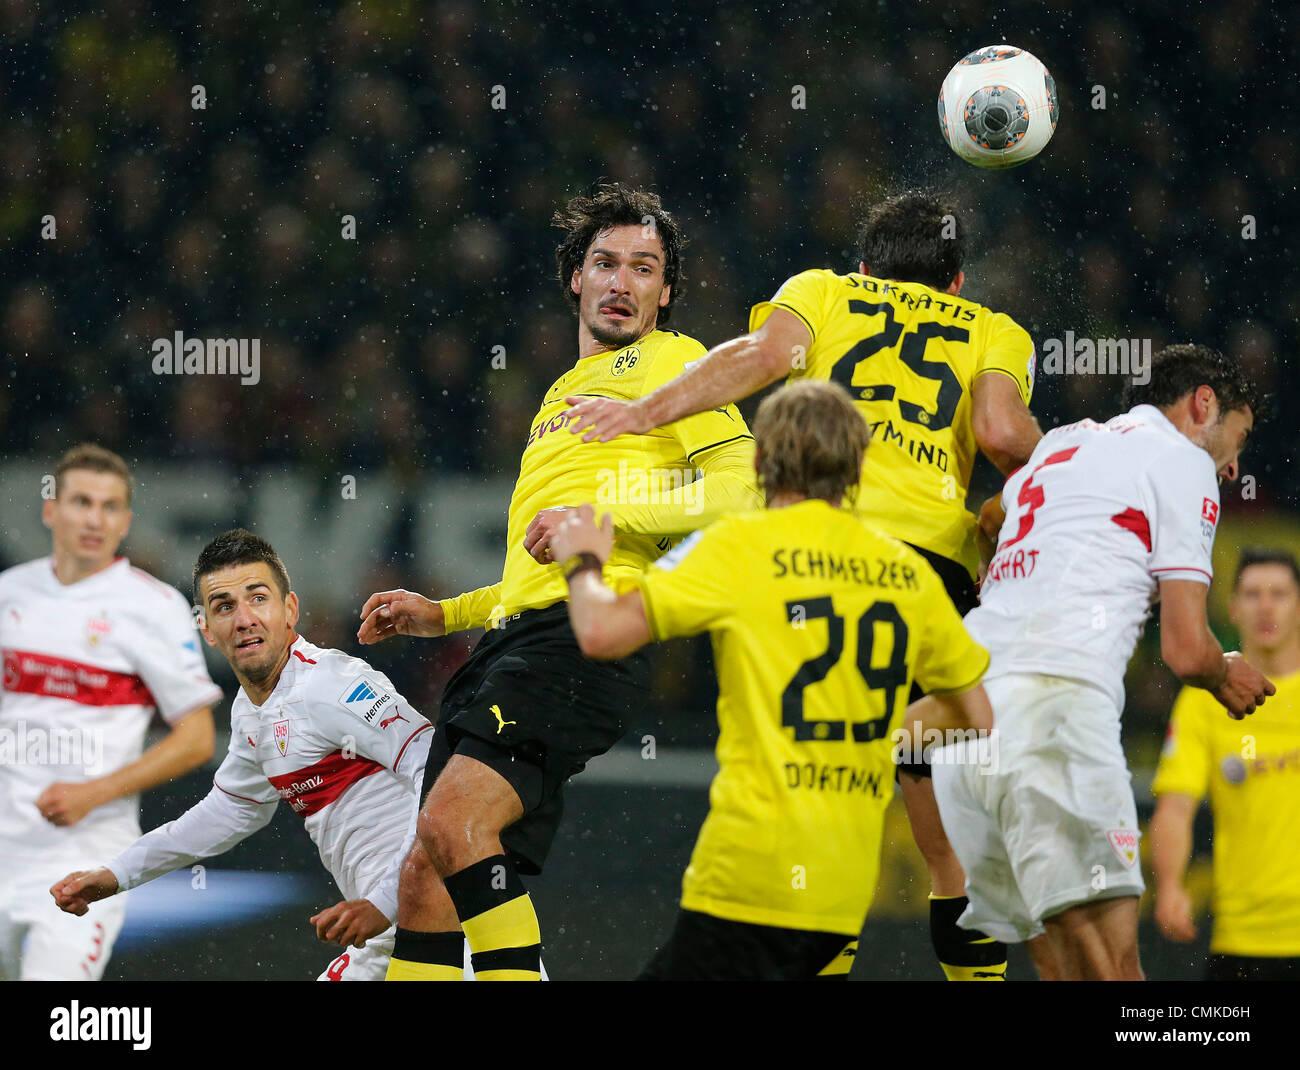 Fussball, Dortmund, Deutschland , 1. Bundesliga ,  11. Spieltag, Borussia Dortmund (BVB) - VFB Stuttgart (VFB)  - Stock Image